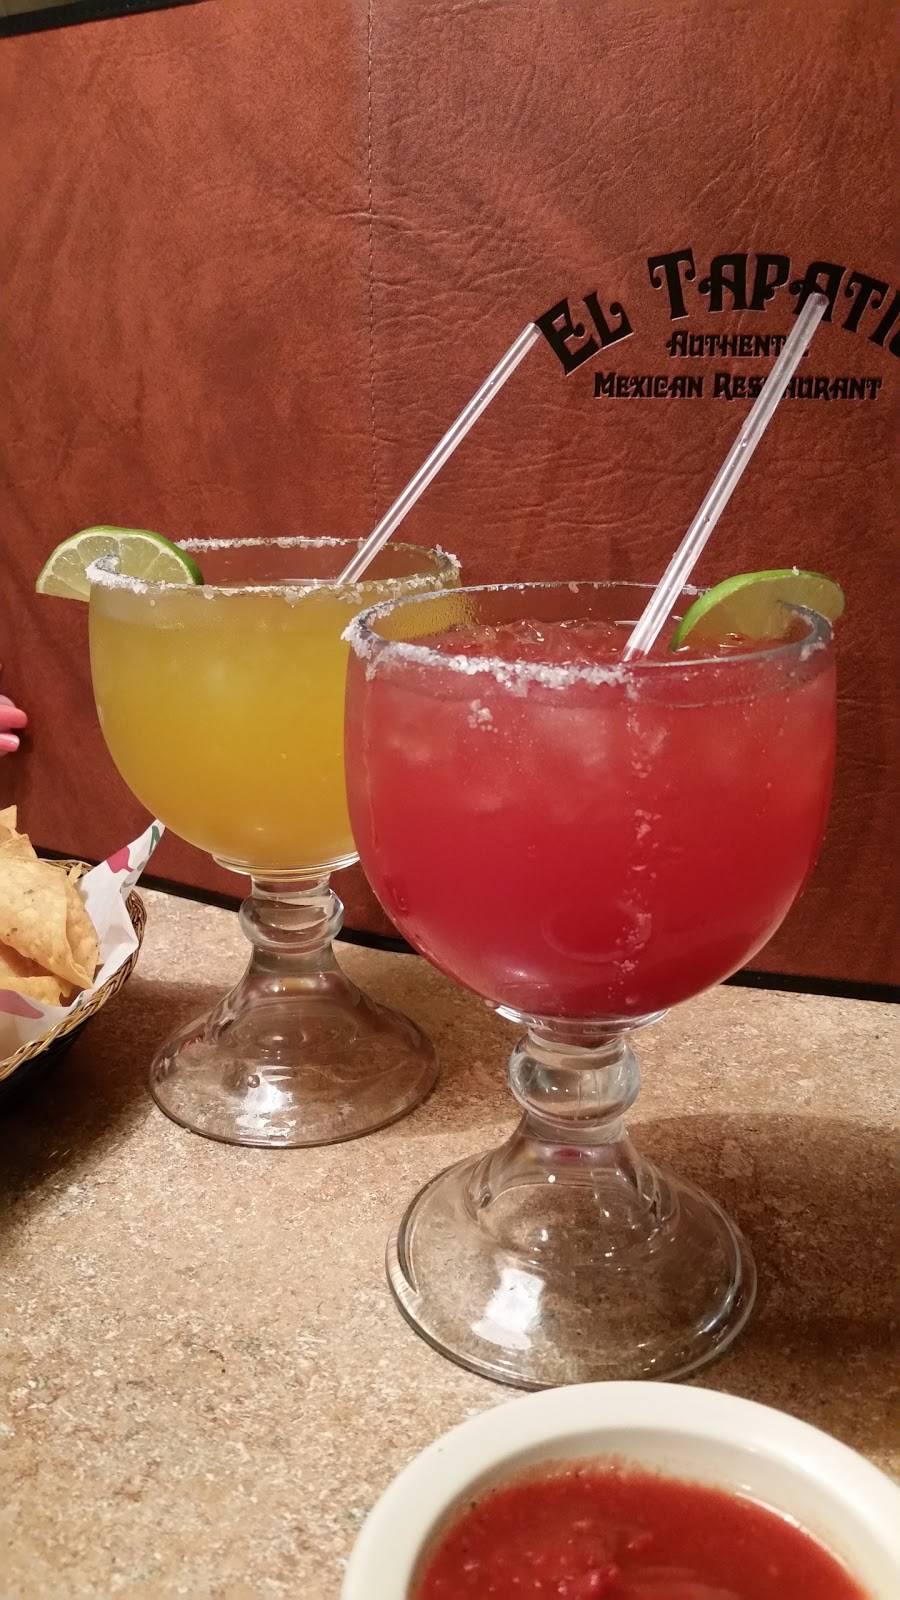 El Tapatio of Park Hills   restaurant   1428 S St Joe Dr, Park Hills, MO 63601, USA   5734314171 OR +1 573-431-4171